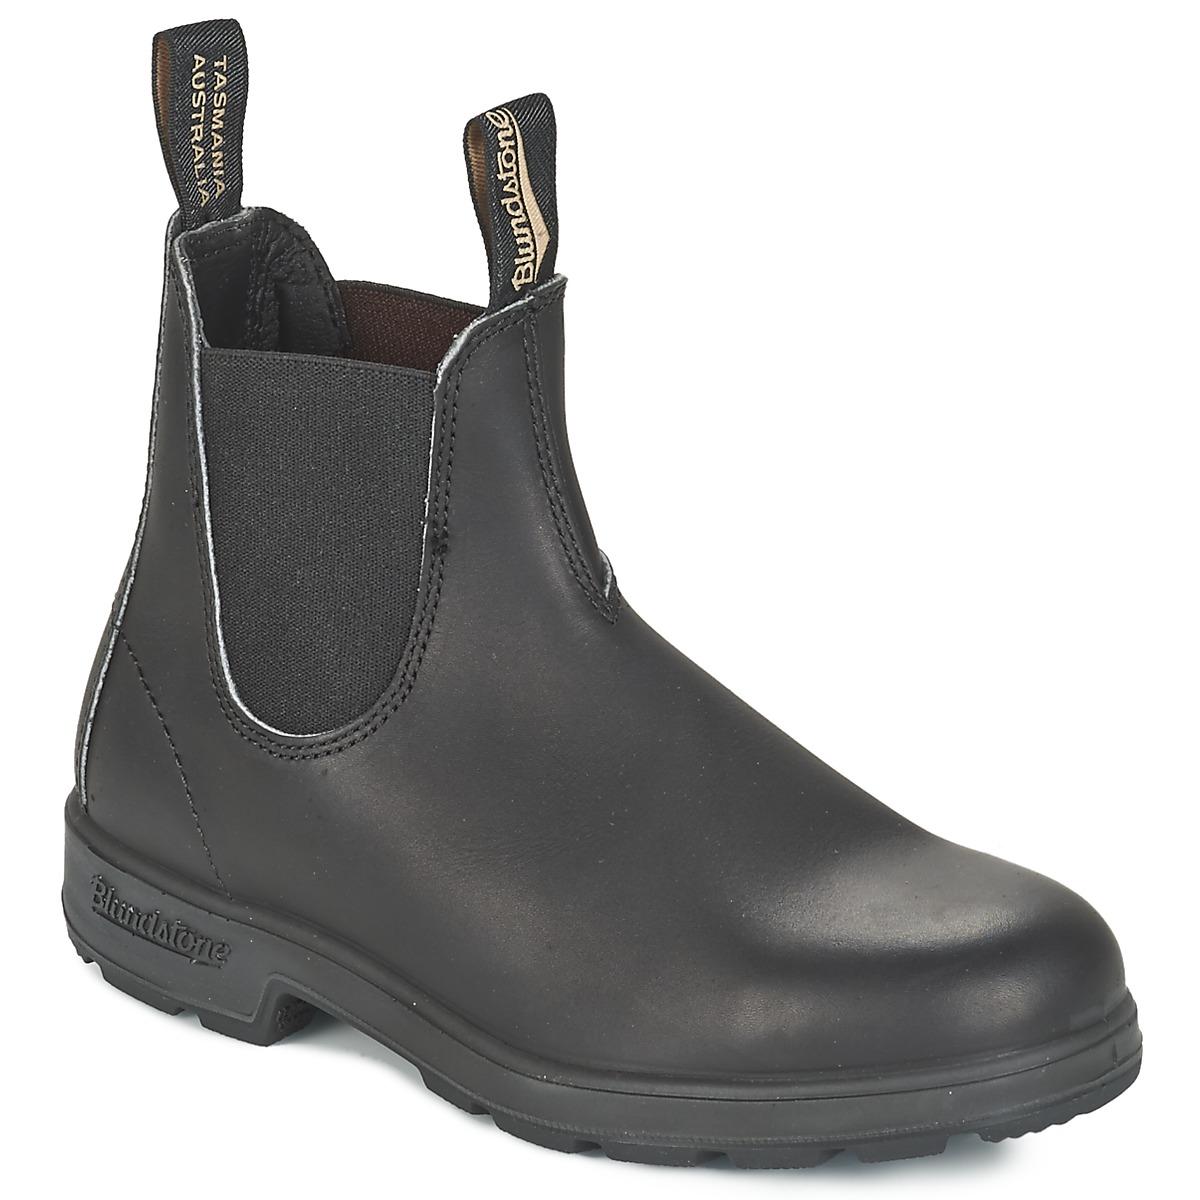 Blundstone CLASSIC BOOT Noir / Marron